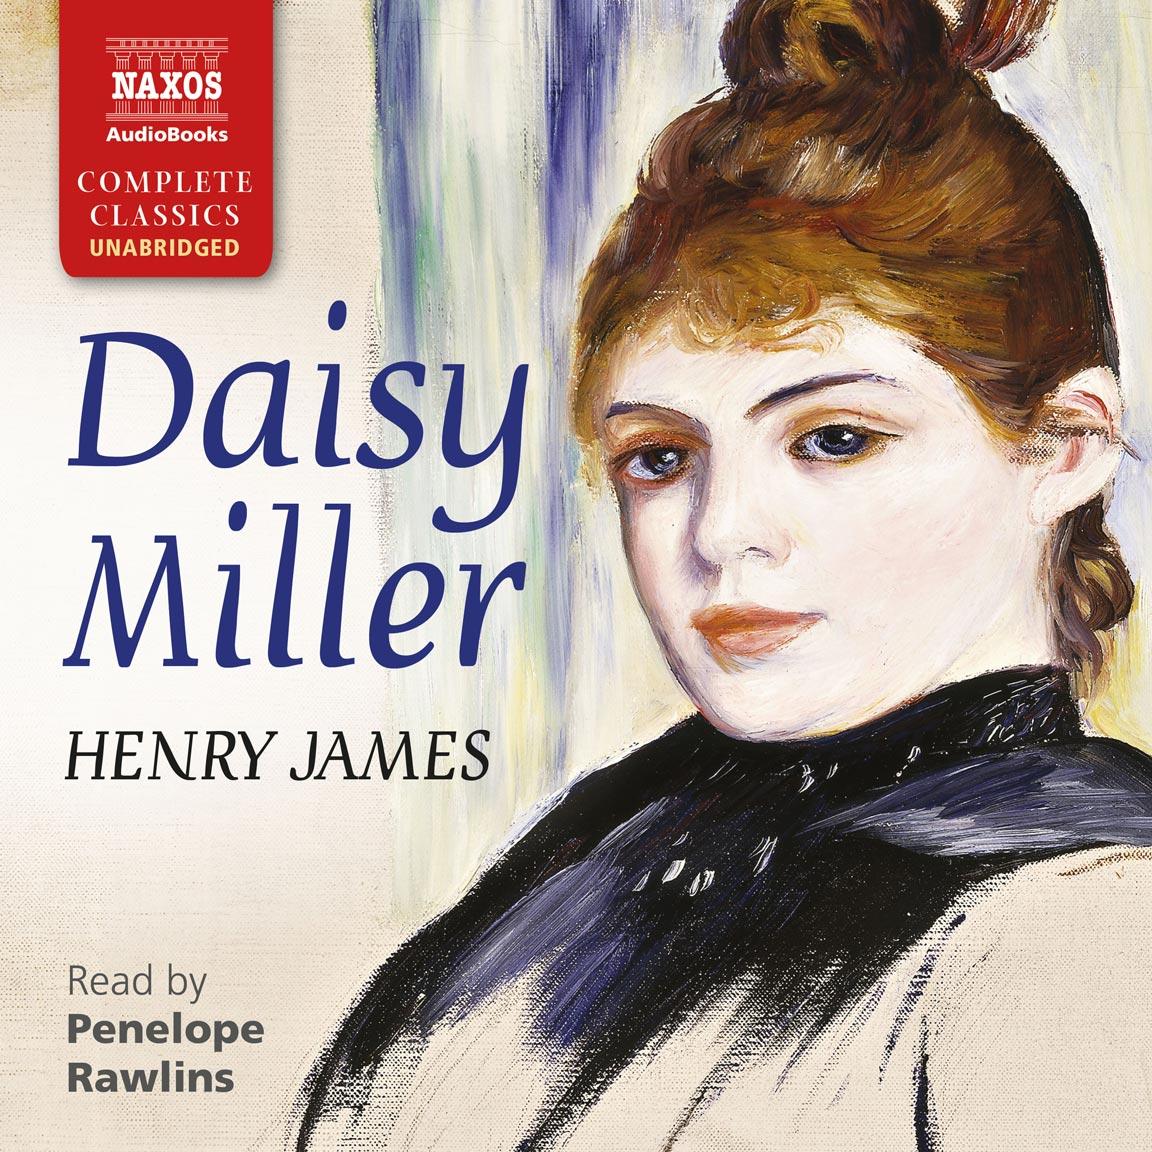 Daisy Miller (unabridged)